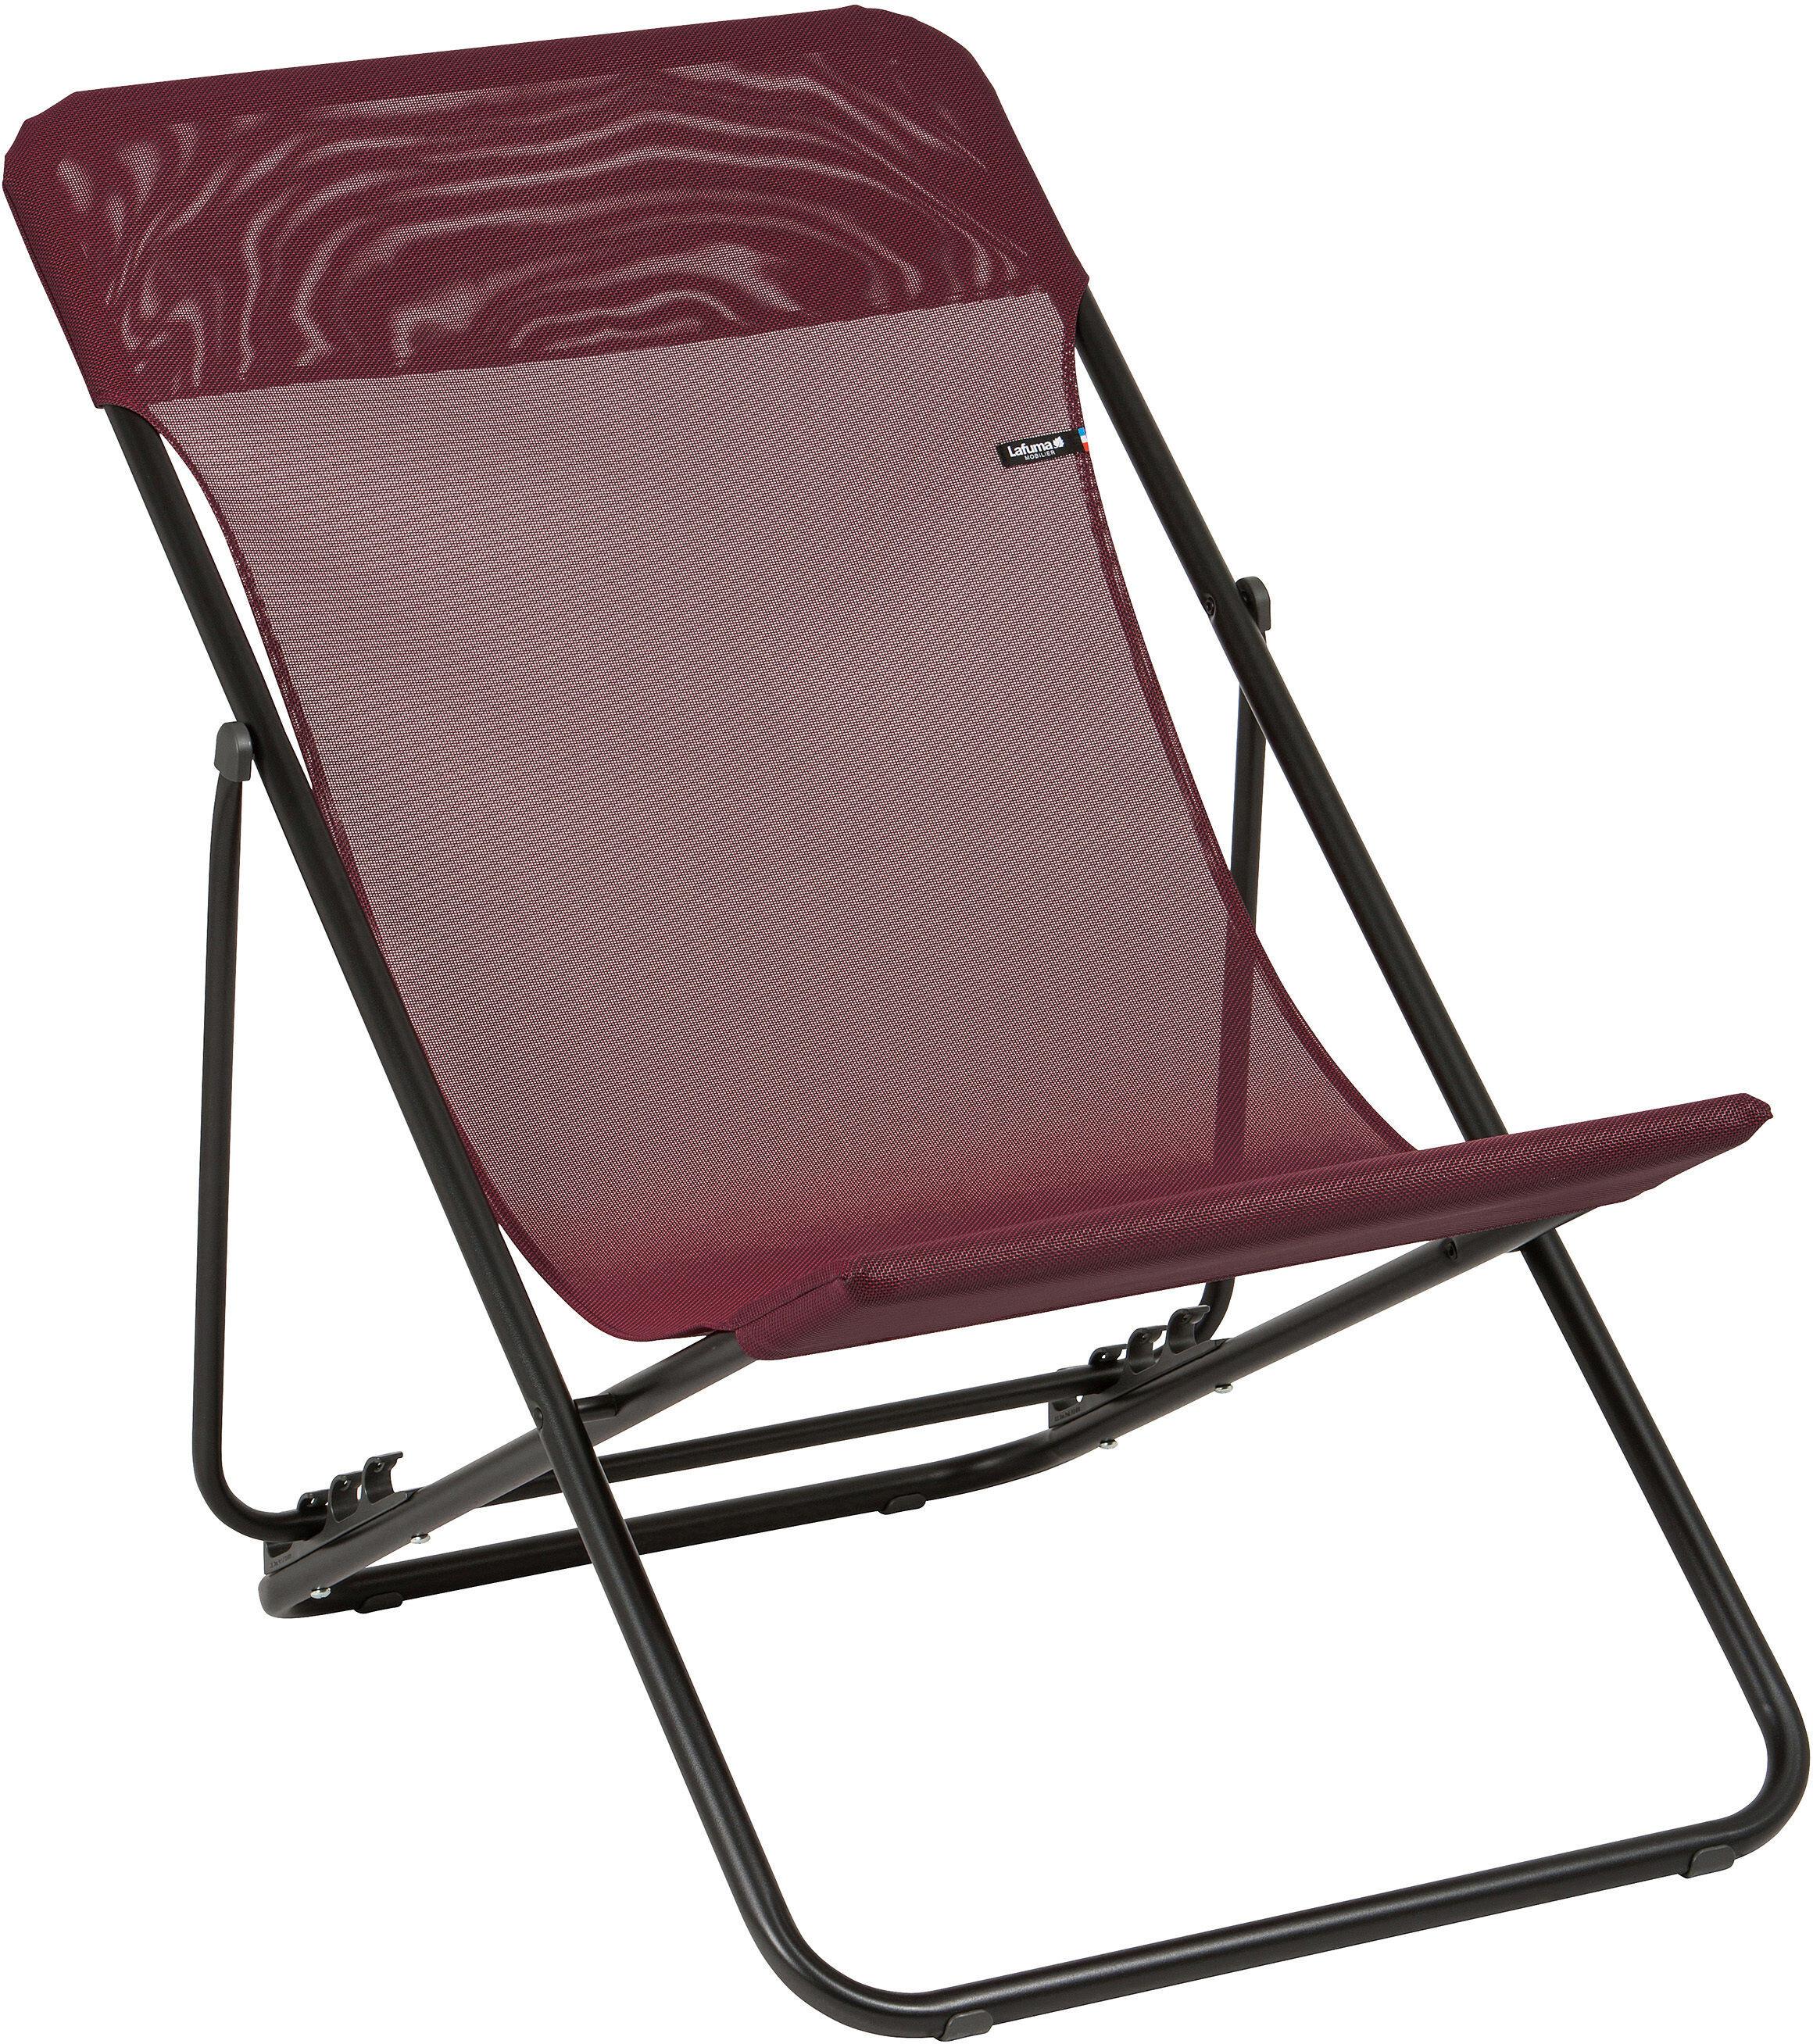 lafuma mobilier maxi transat camp stool batyline grey red. Black Bedroom Furniture Sets. Home Design Ideas